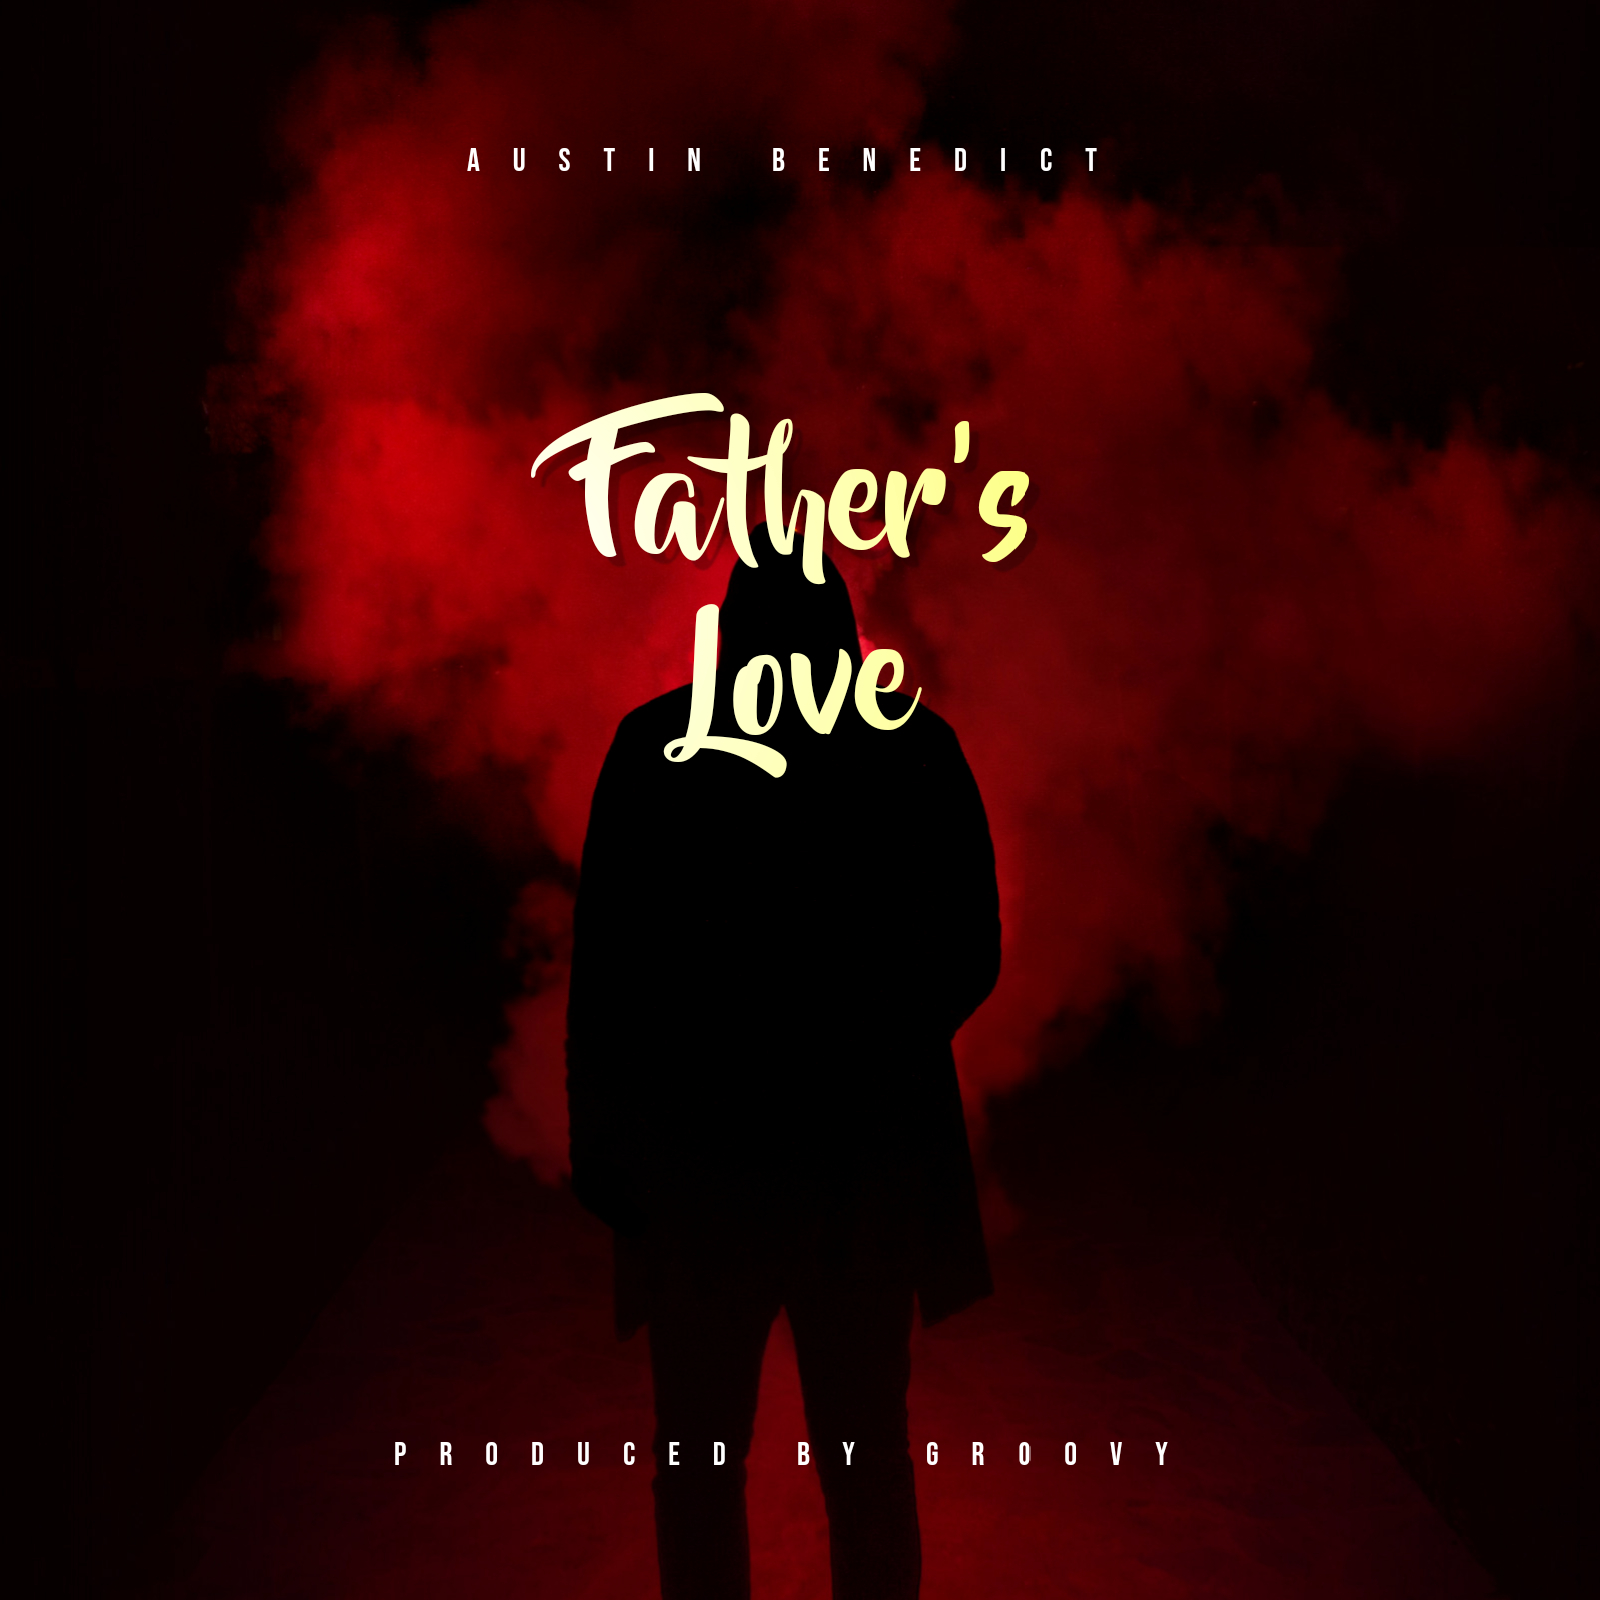 FATHER'S LOVE - Austin Benedict  [@austin_ben01]